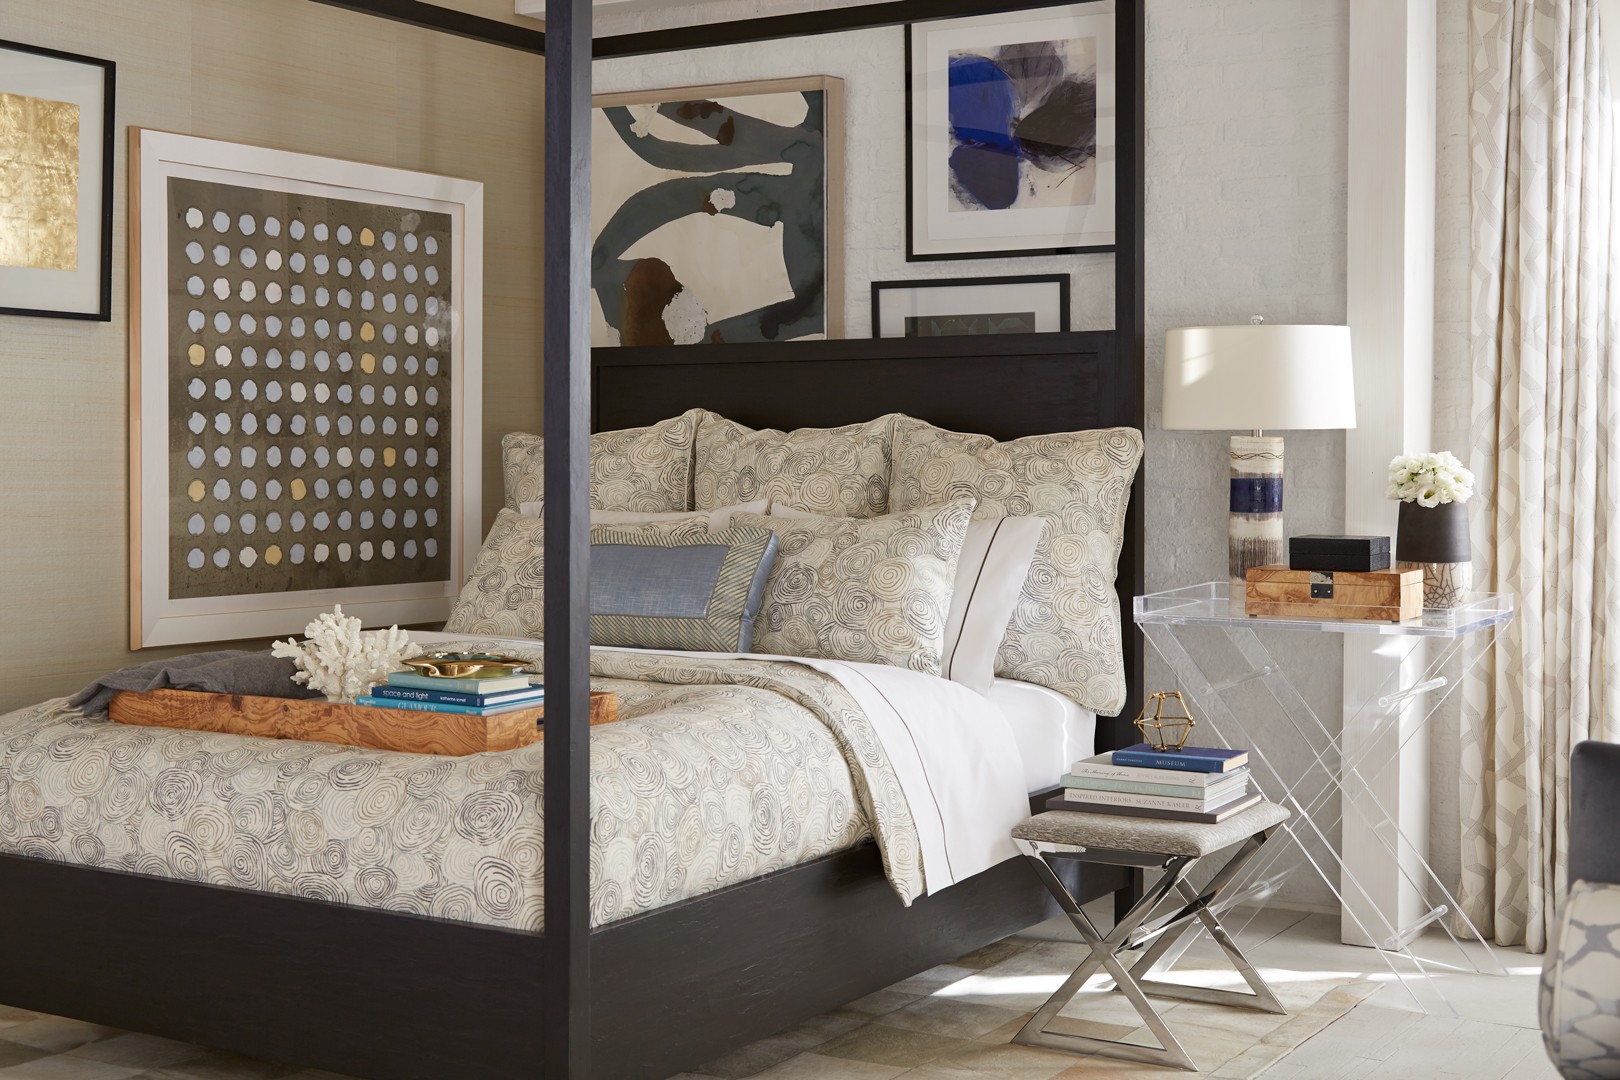 1080-Bedroom.jpg